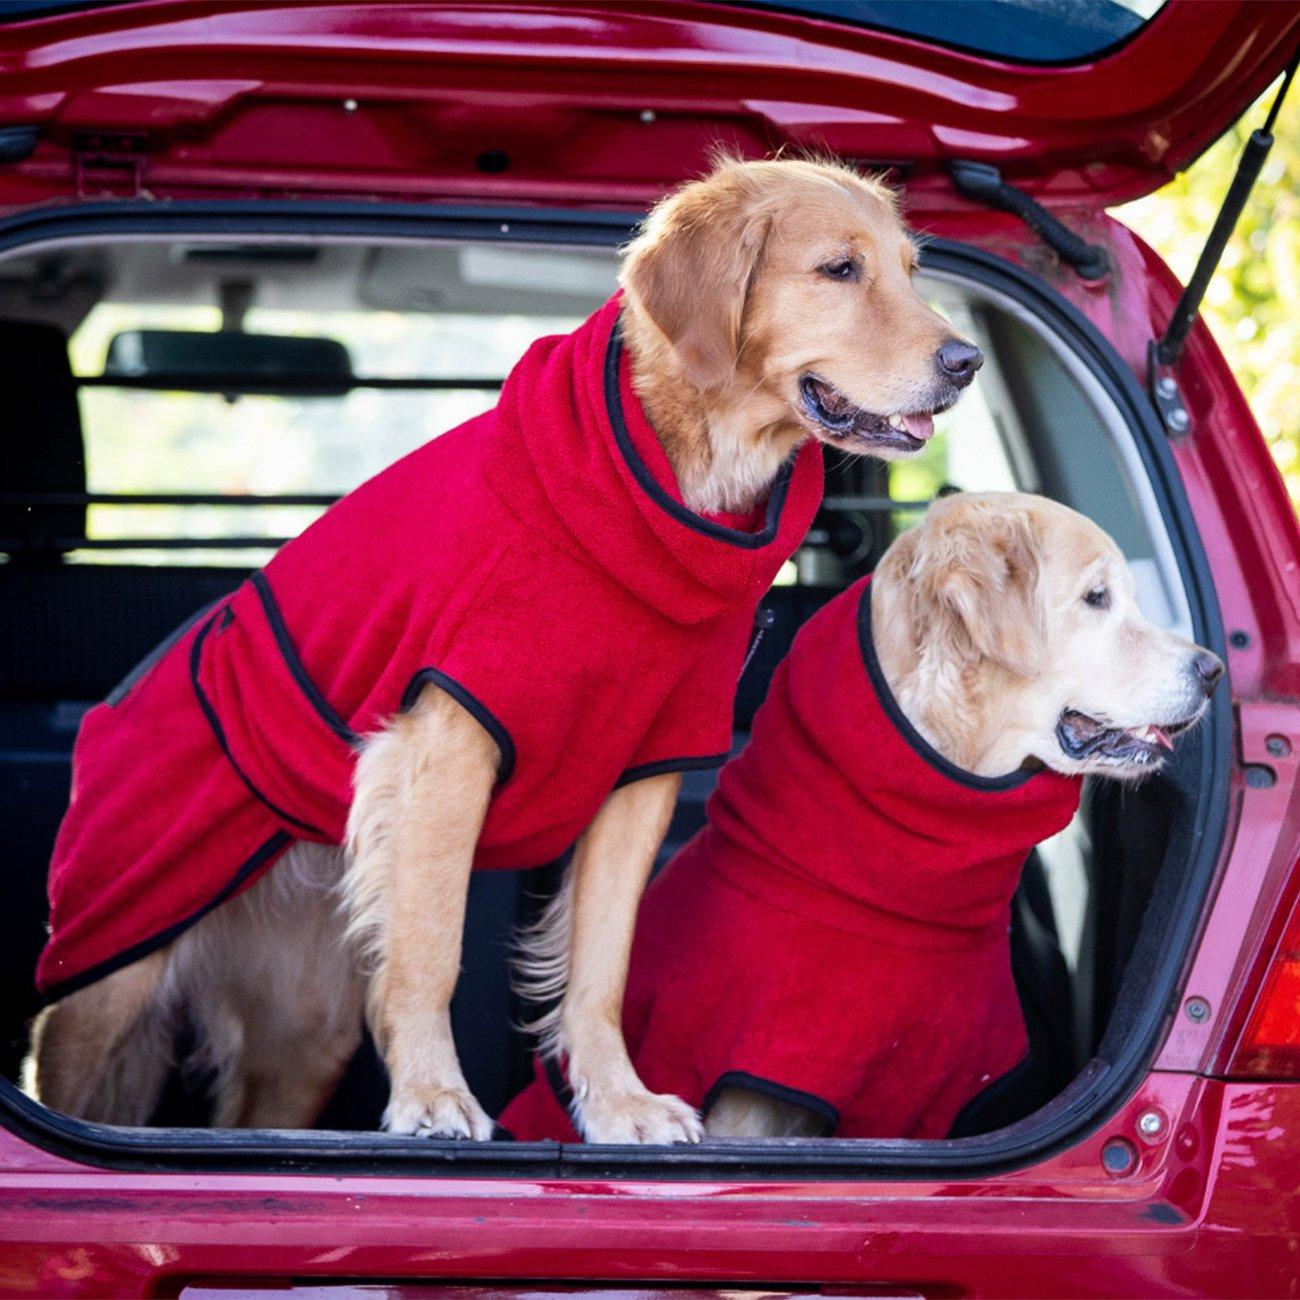 fit4dogs Trockenmantel Hund Dryup Cape, Bild 16